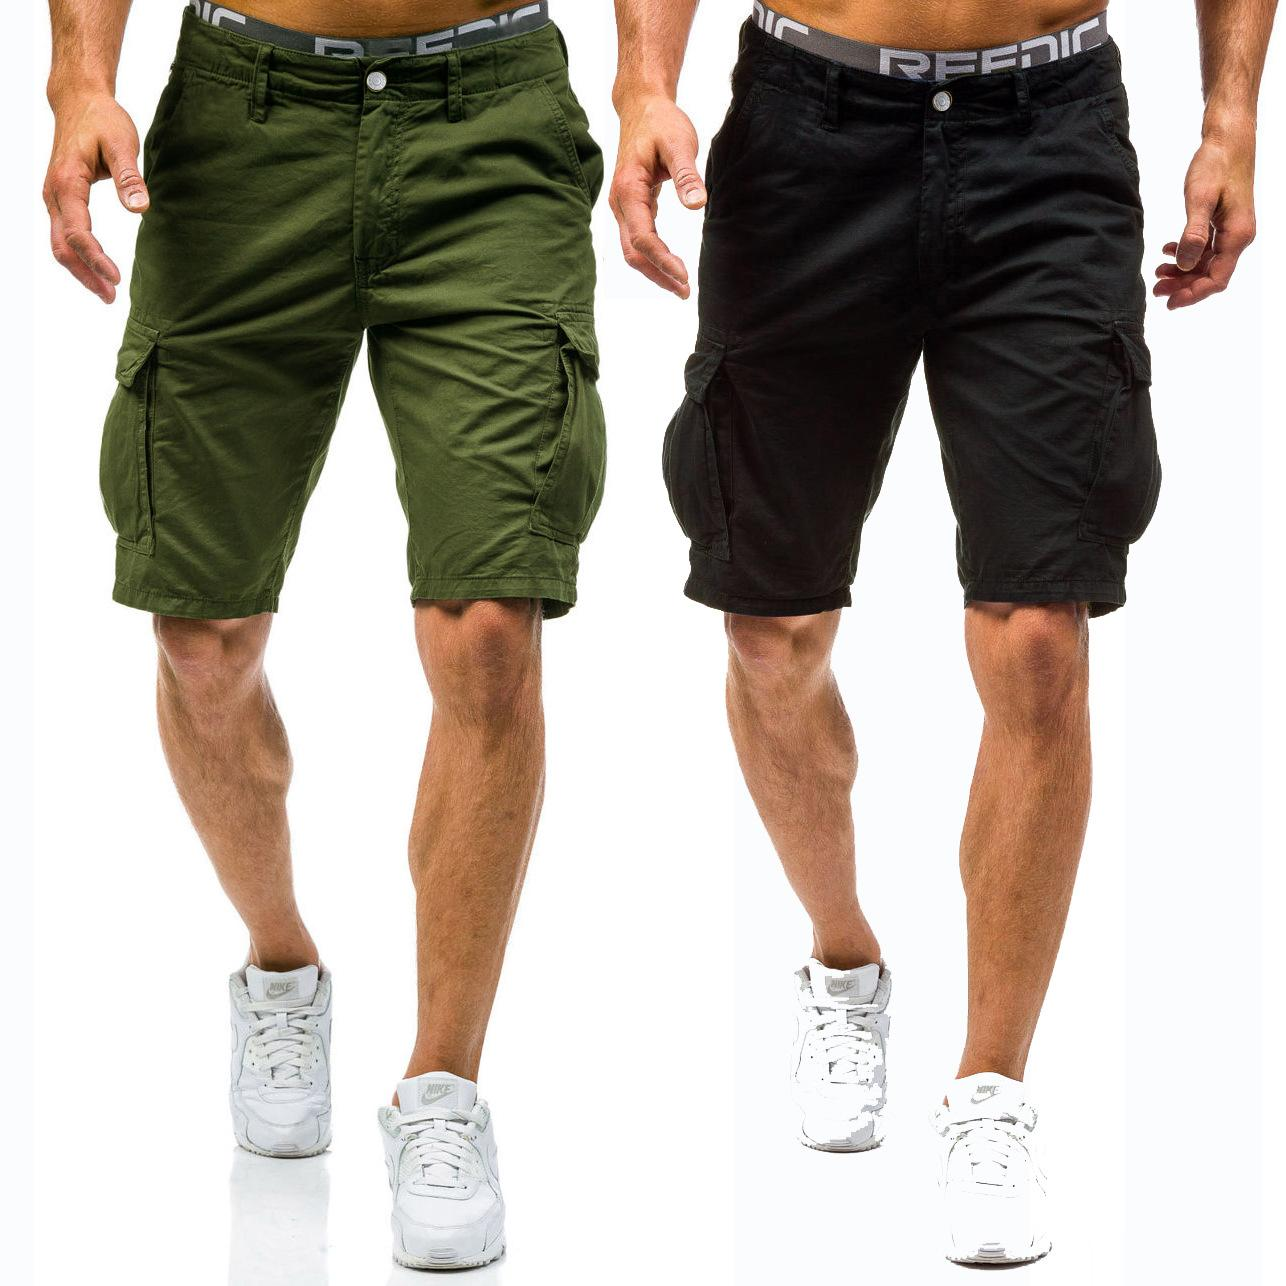 684164331c7 2018 Summer New Arrival Mens Cargo Shorts Cotton Short Pants ...